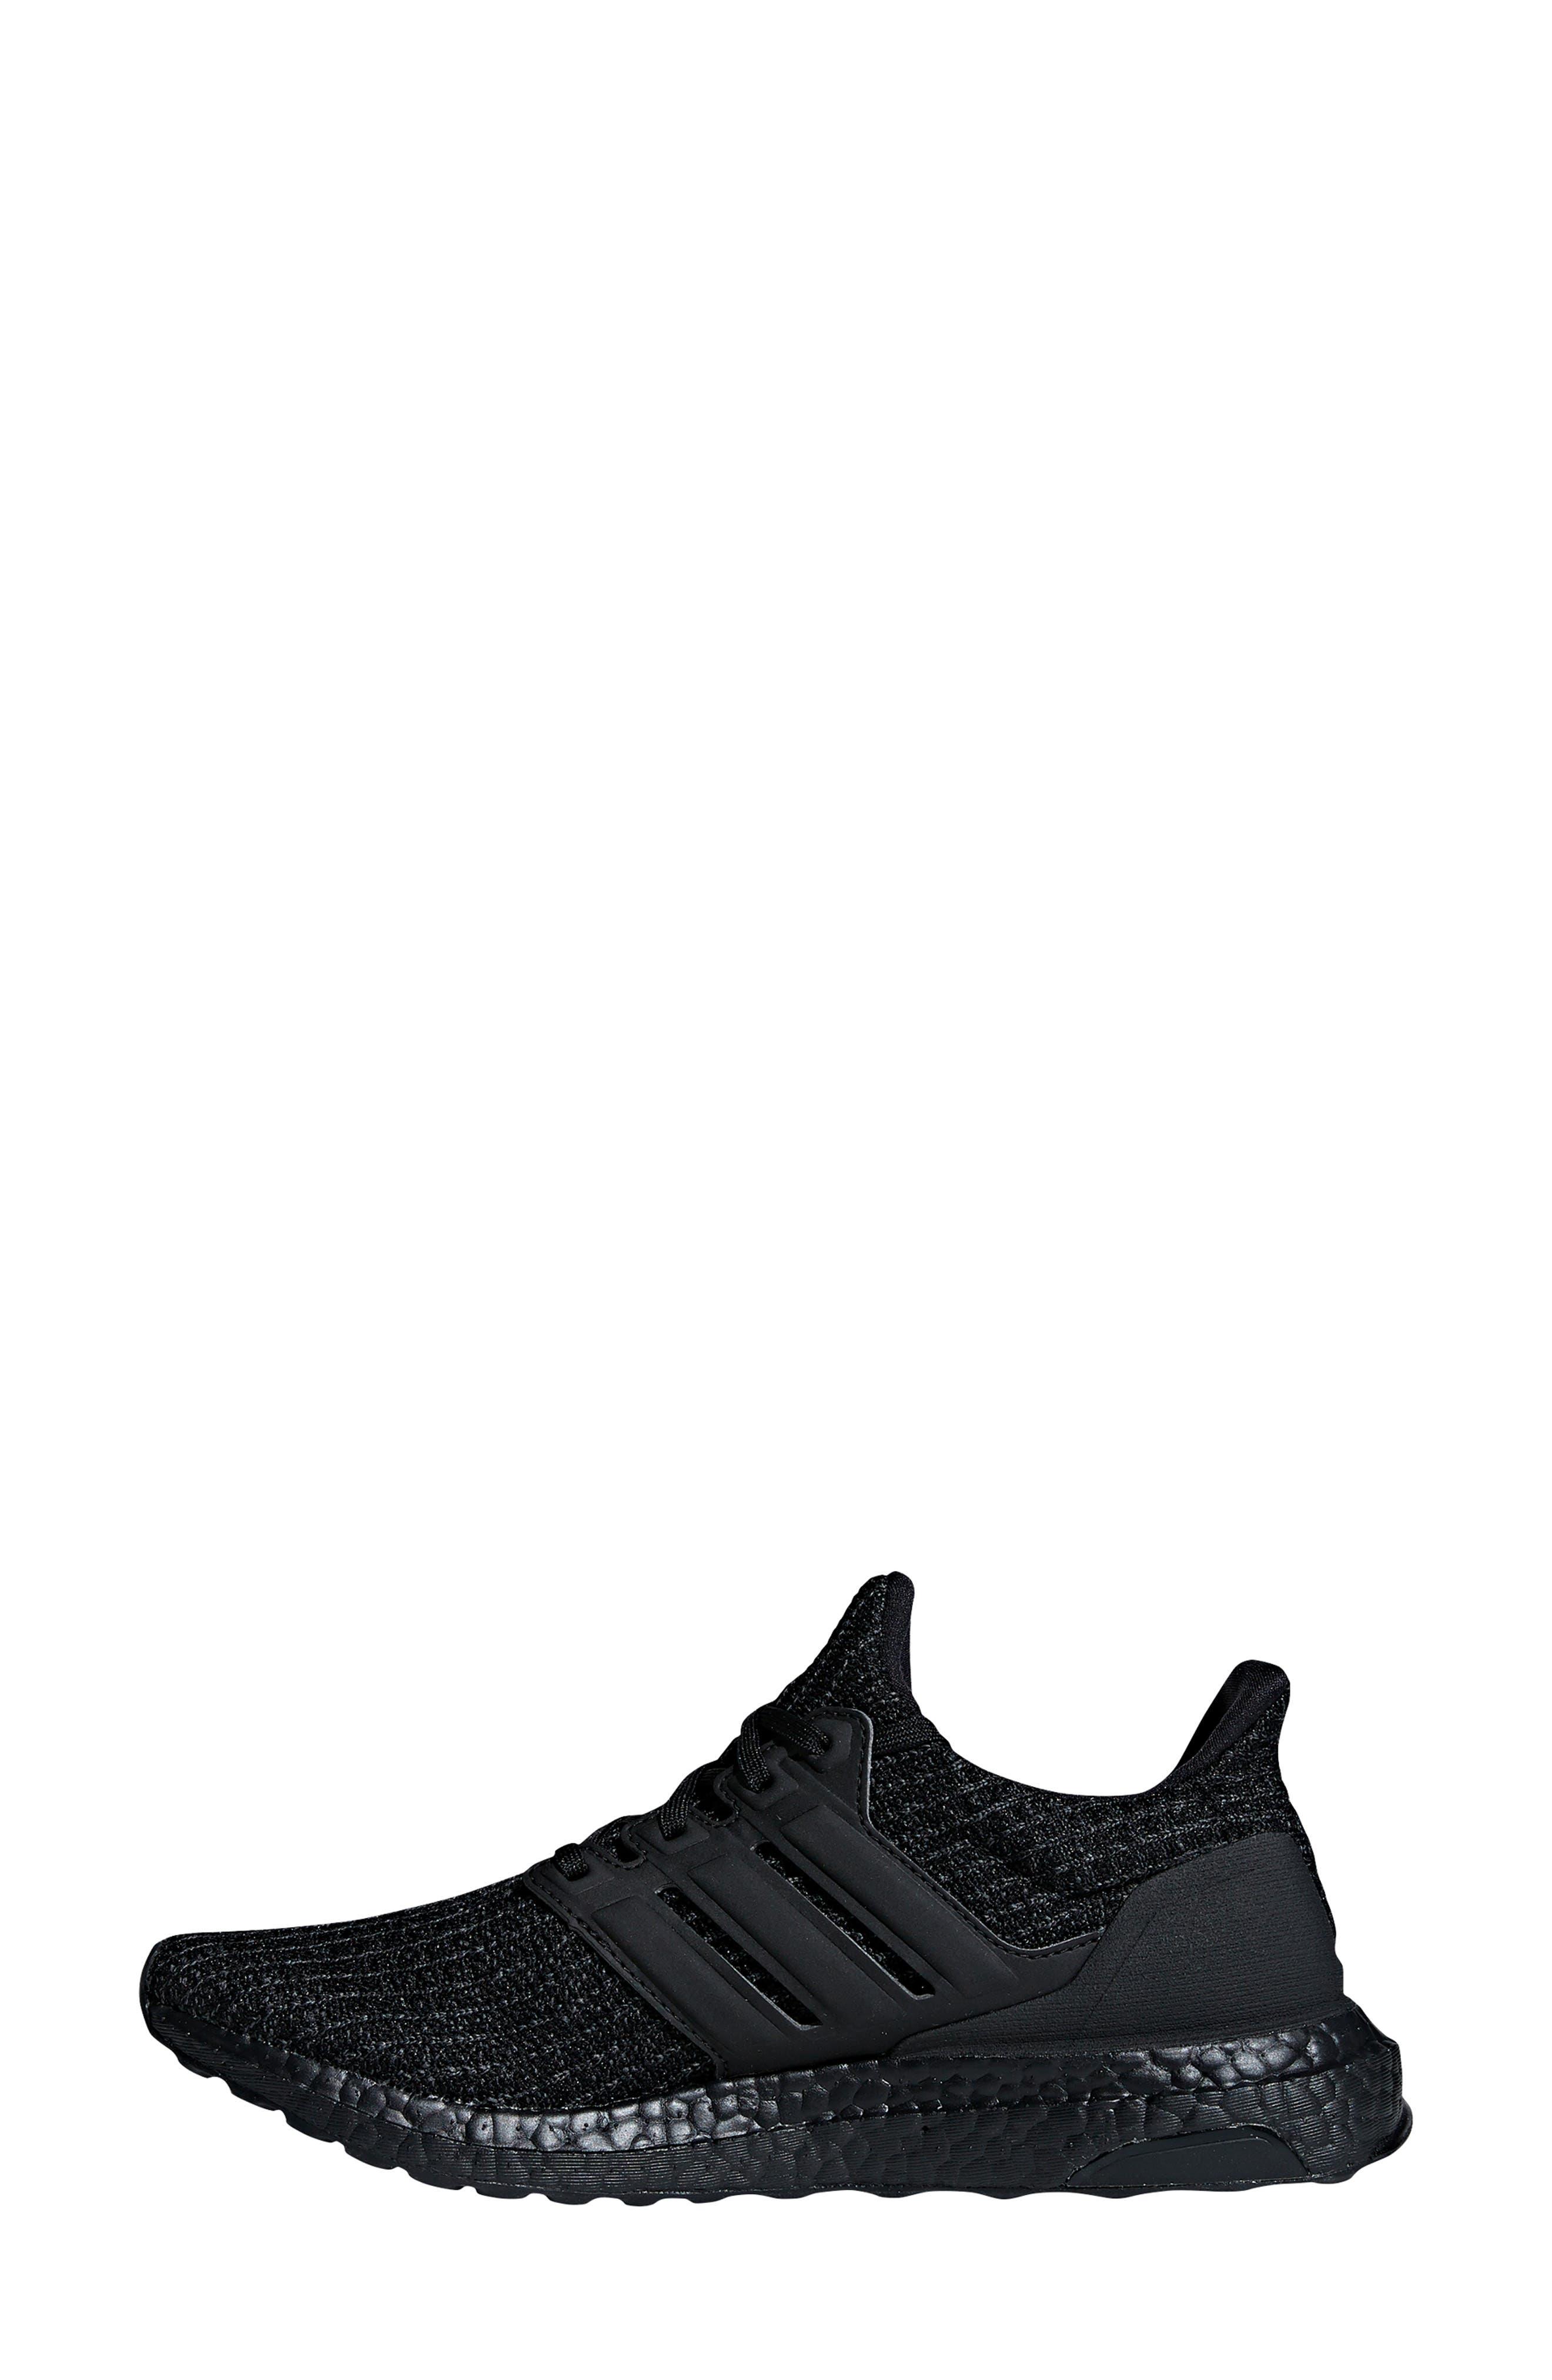 ADIDAS, 'UltraBoost' Running Shoe, Alternate thumbnail 10, color, CORE BLACK/ GOLD METALLIC